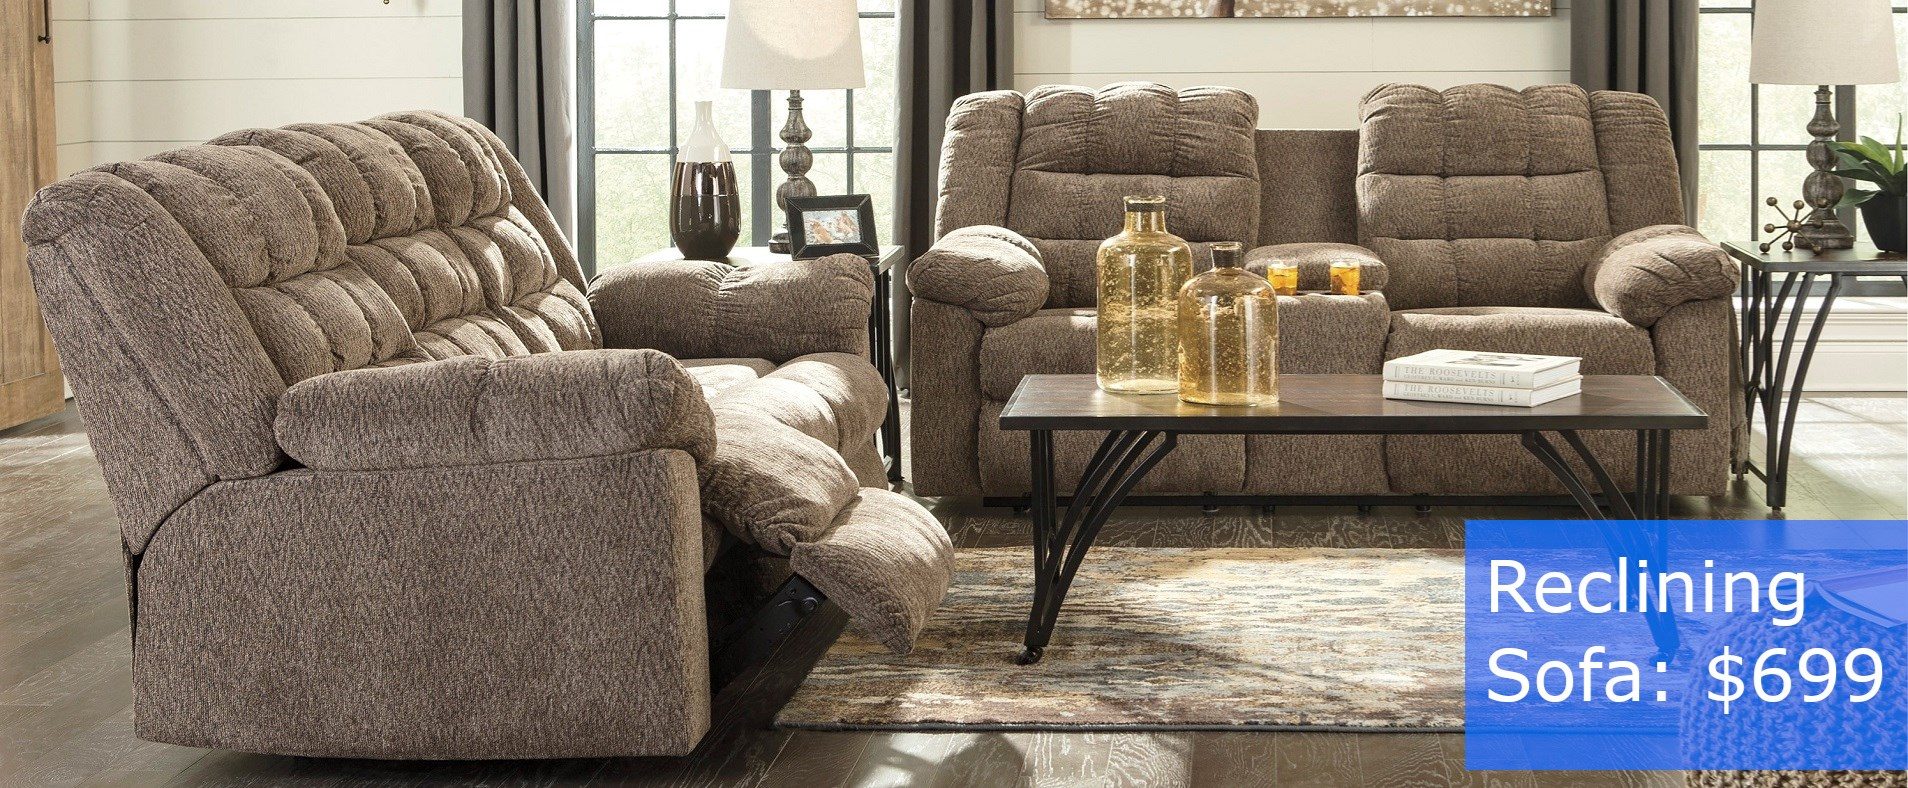 Reclining Sofa WH